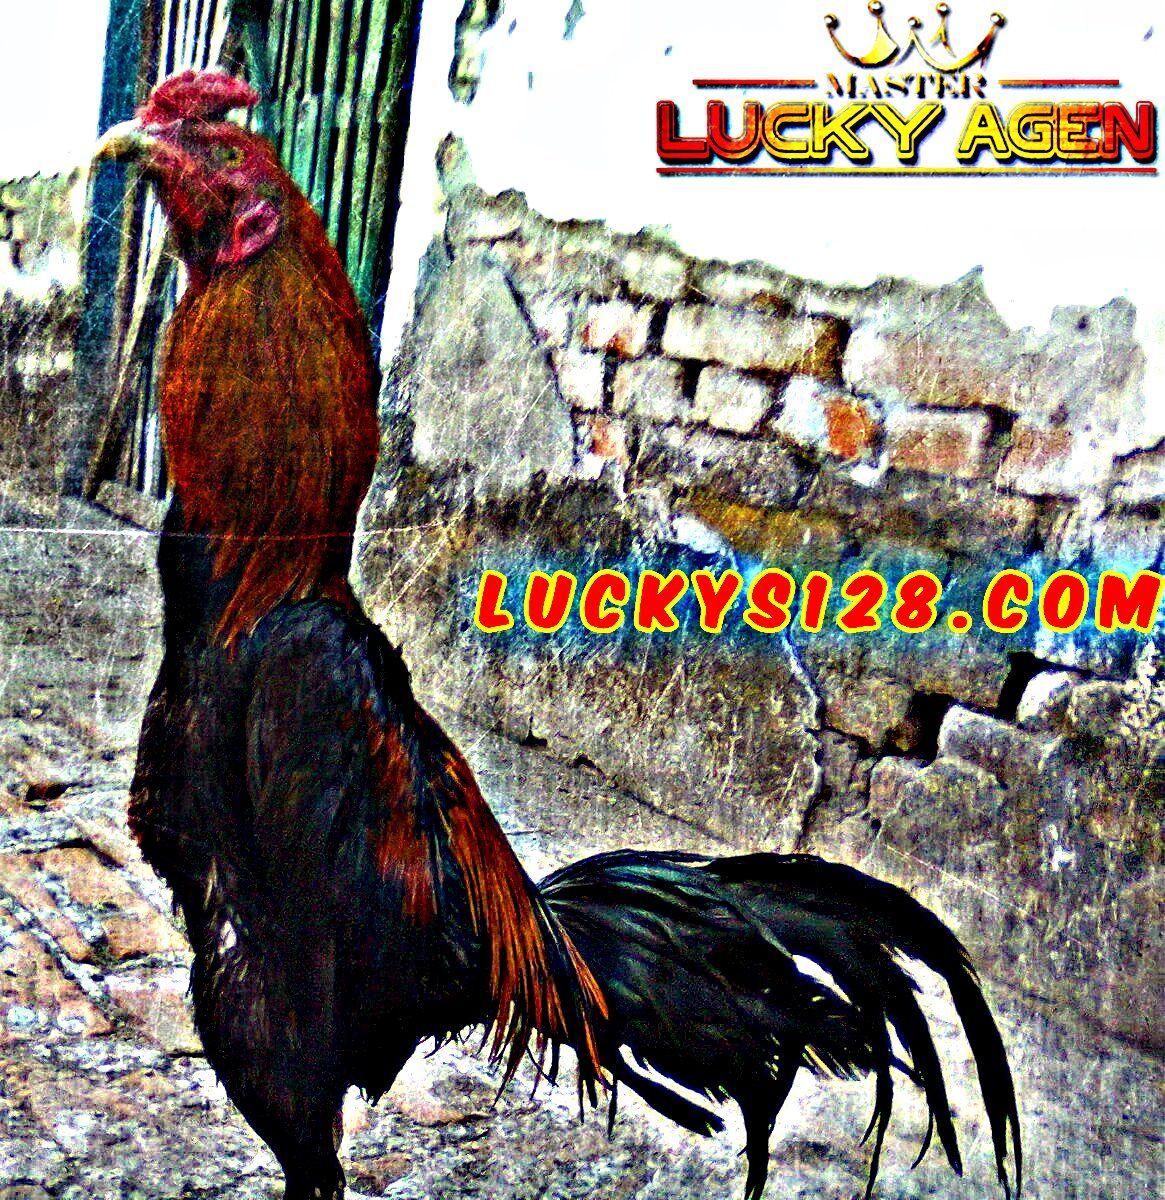 Sabung Ayam Terbaik - Ayam wiring galih merupakan salah satu ... on